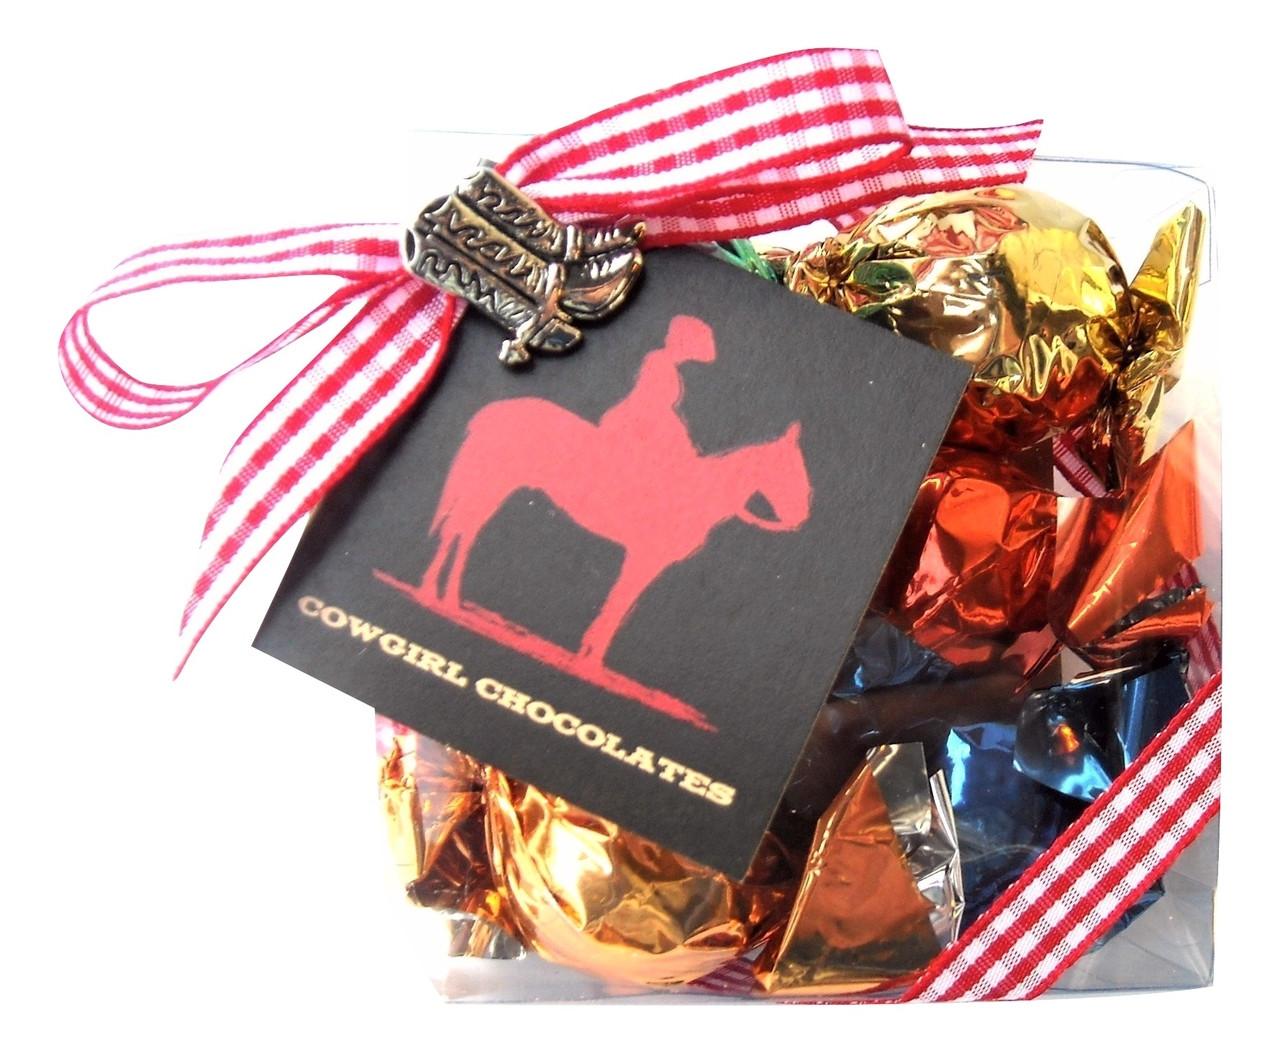 Six Shooter Gift Box - Cowgirl Chocolates